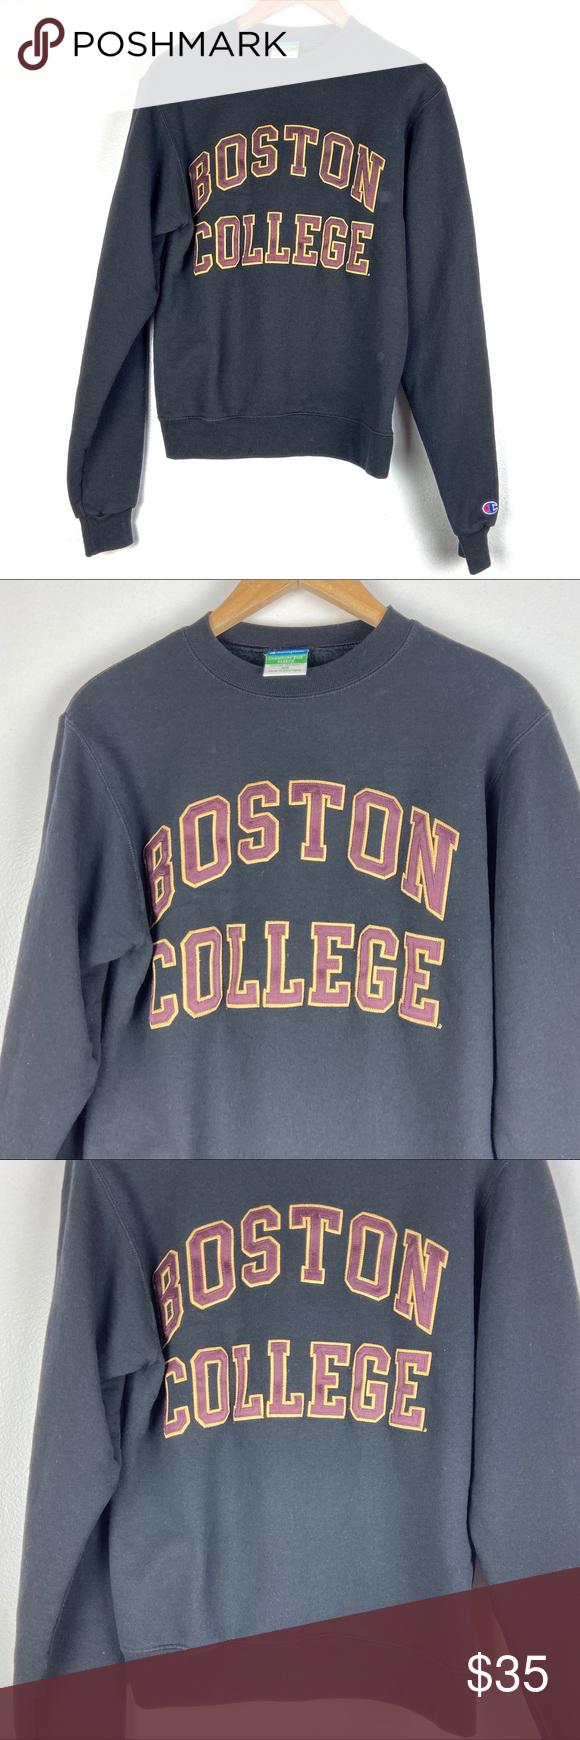 Boston College Sweatshirt Xs Sewn Champion 01401 Sweatshirts College Sweatshirt Sweatshirt Tops [ 1740 x 580 Pixel ]